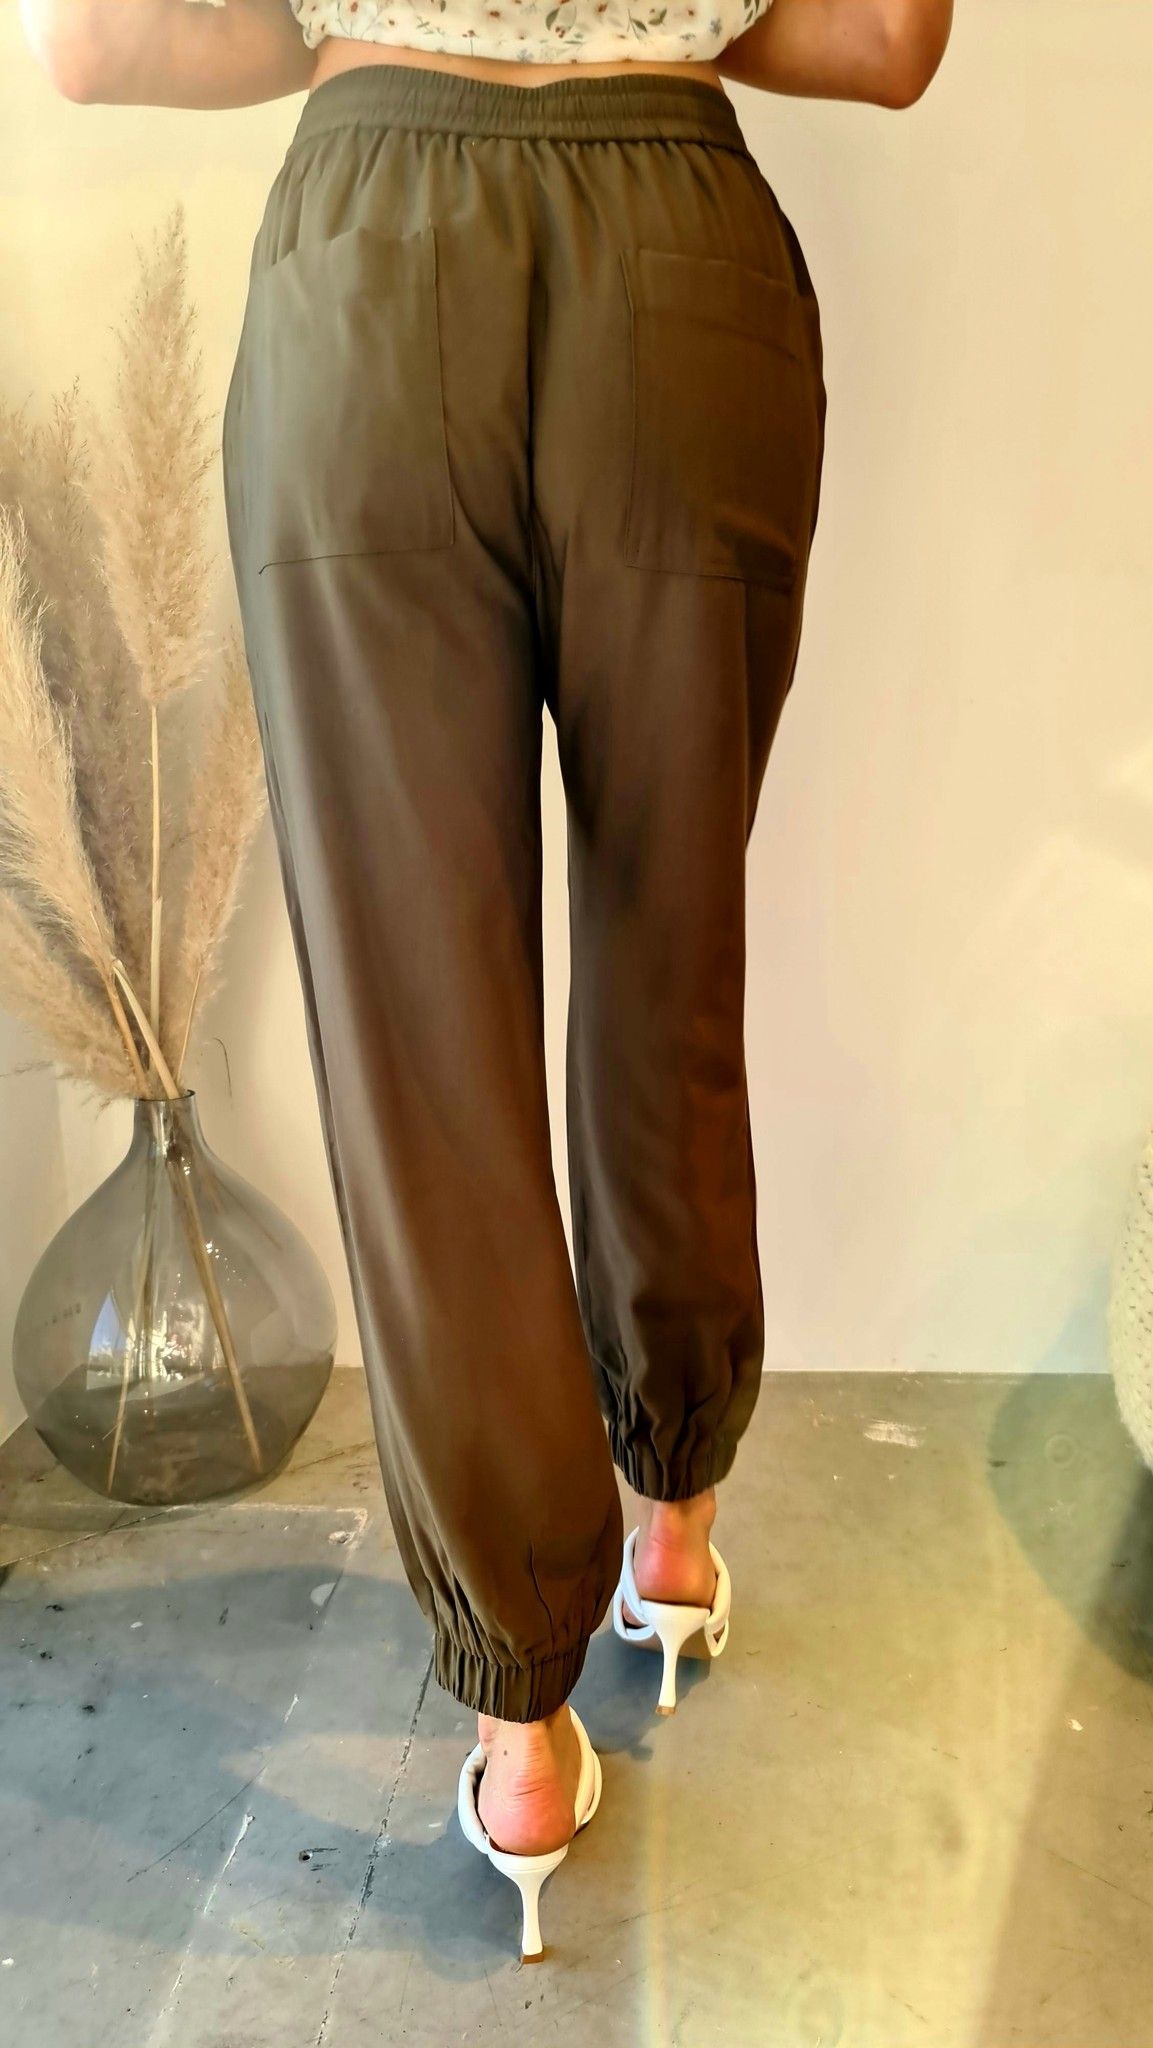 ROMA pantalon-2